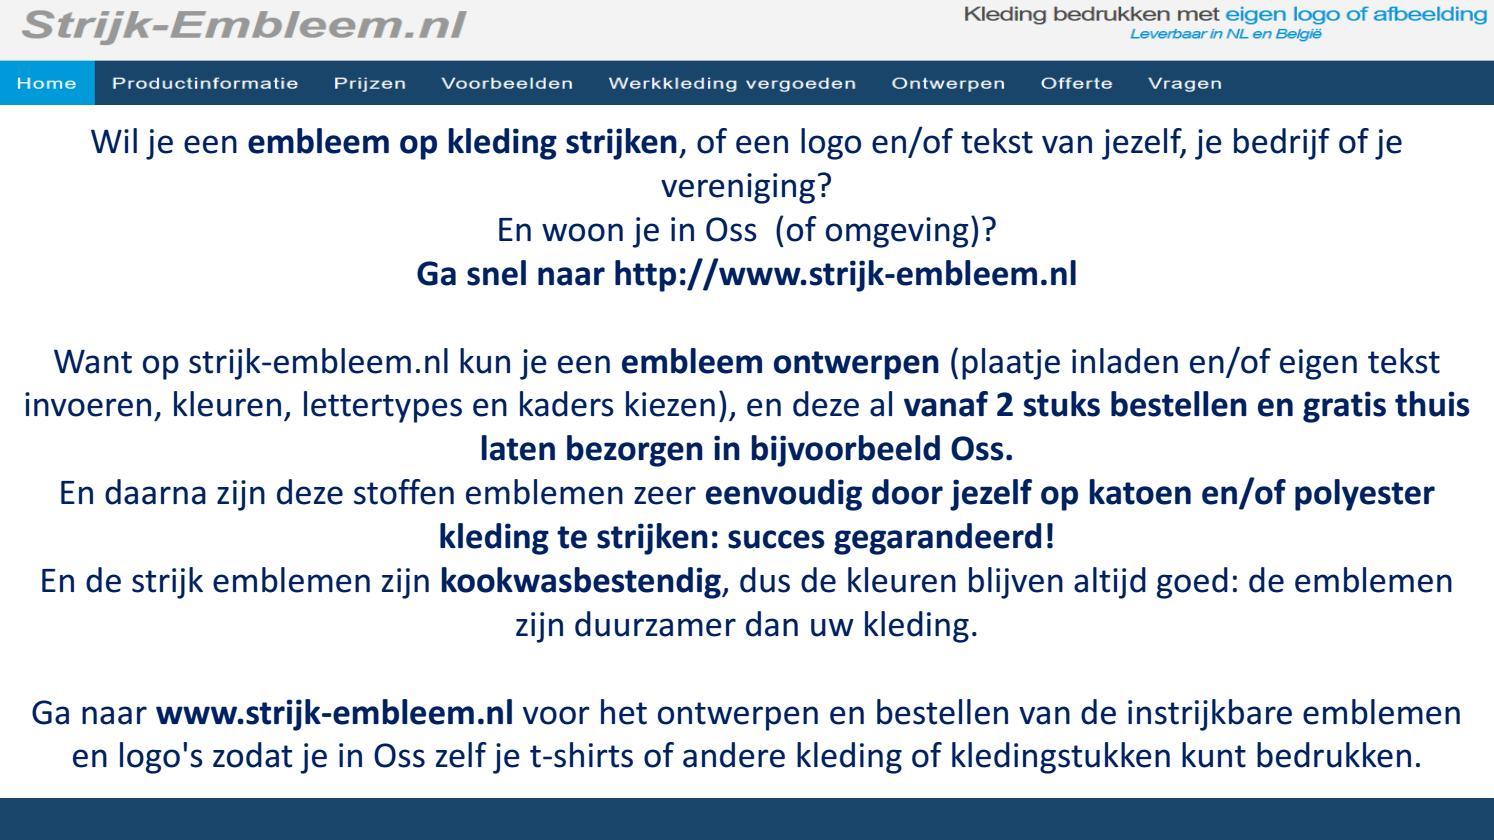 Kleding Strijken Embleem Oss Issuu By Strijk xdBreCo